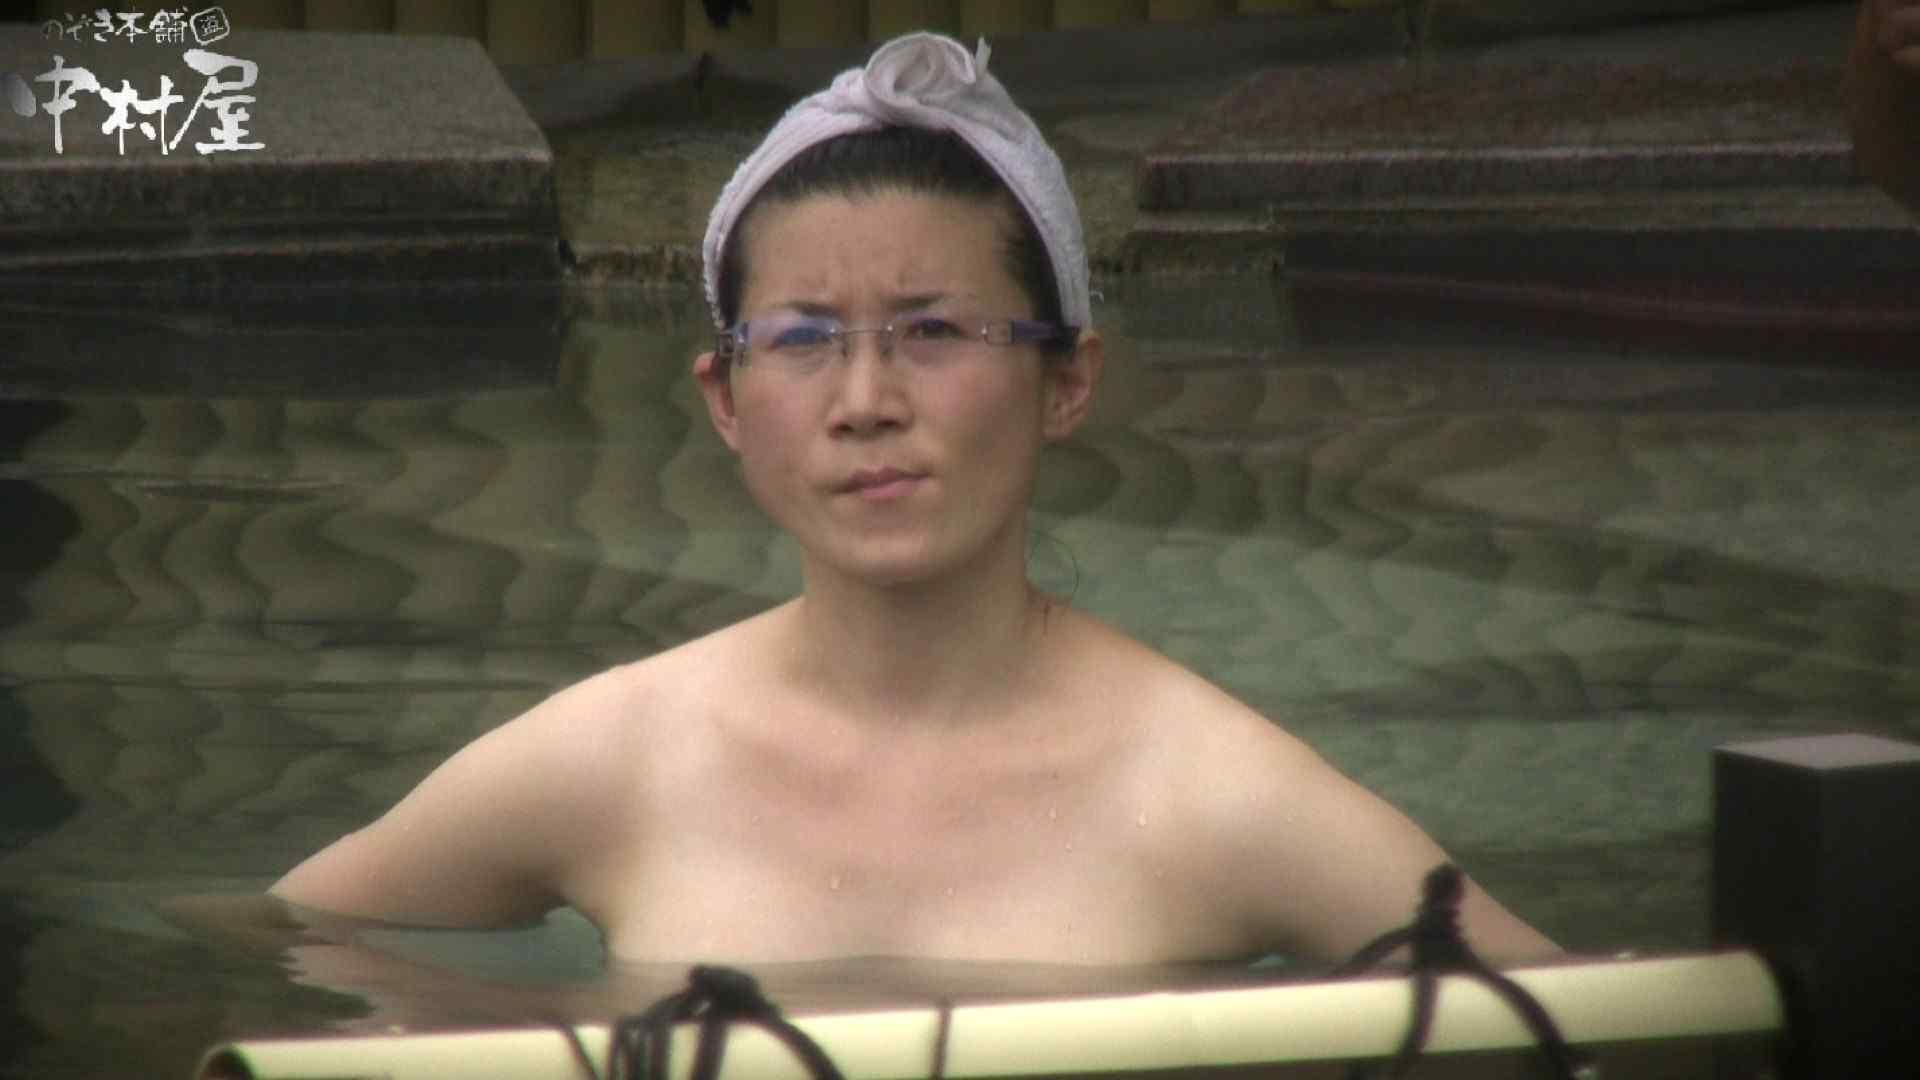 Aquaな露天風呂Vol.905 盗撮   OLエロ画像  67PICs 25